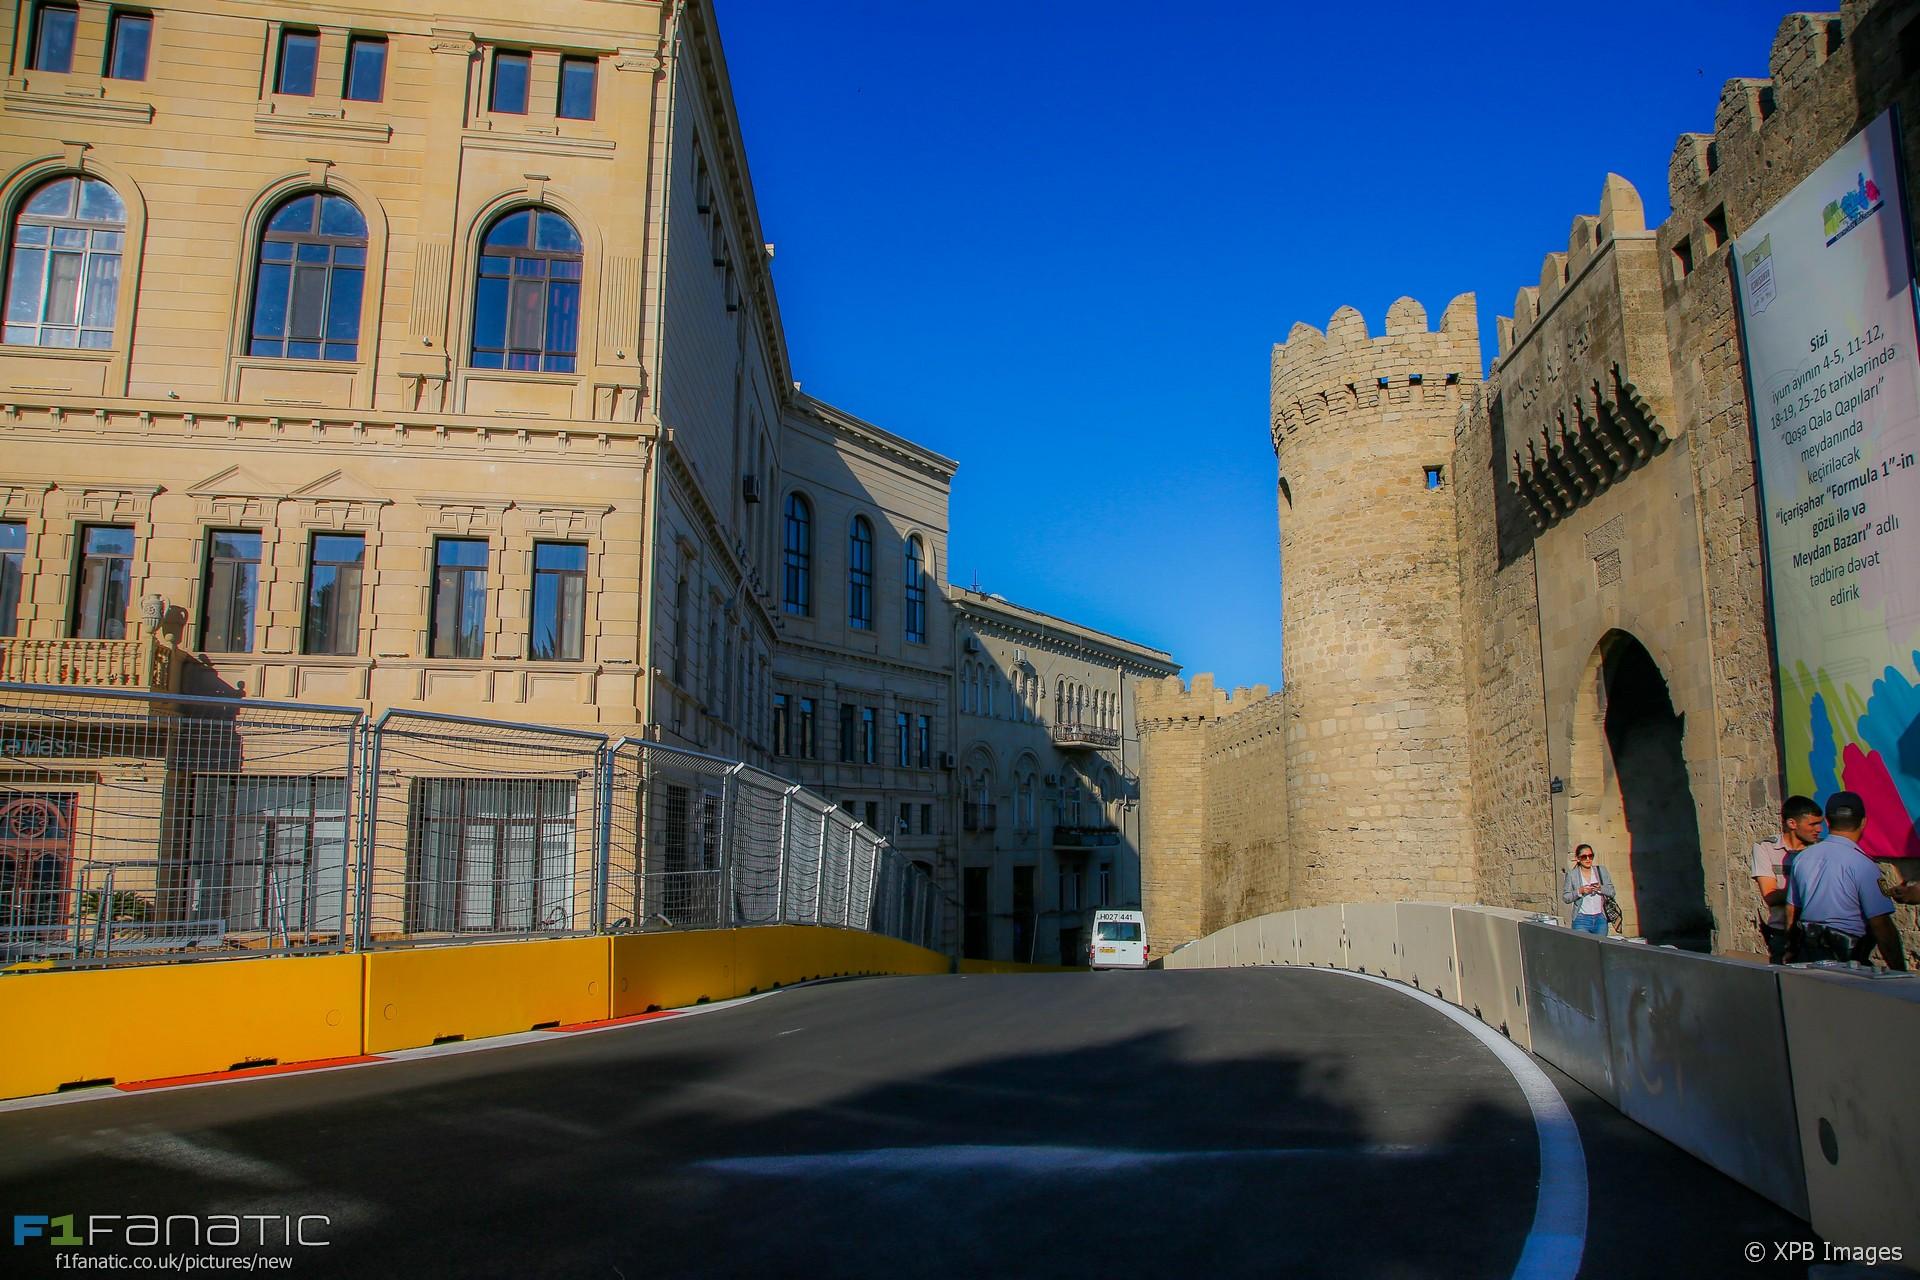 Turn 10, Baku City Circuit, 2016